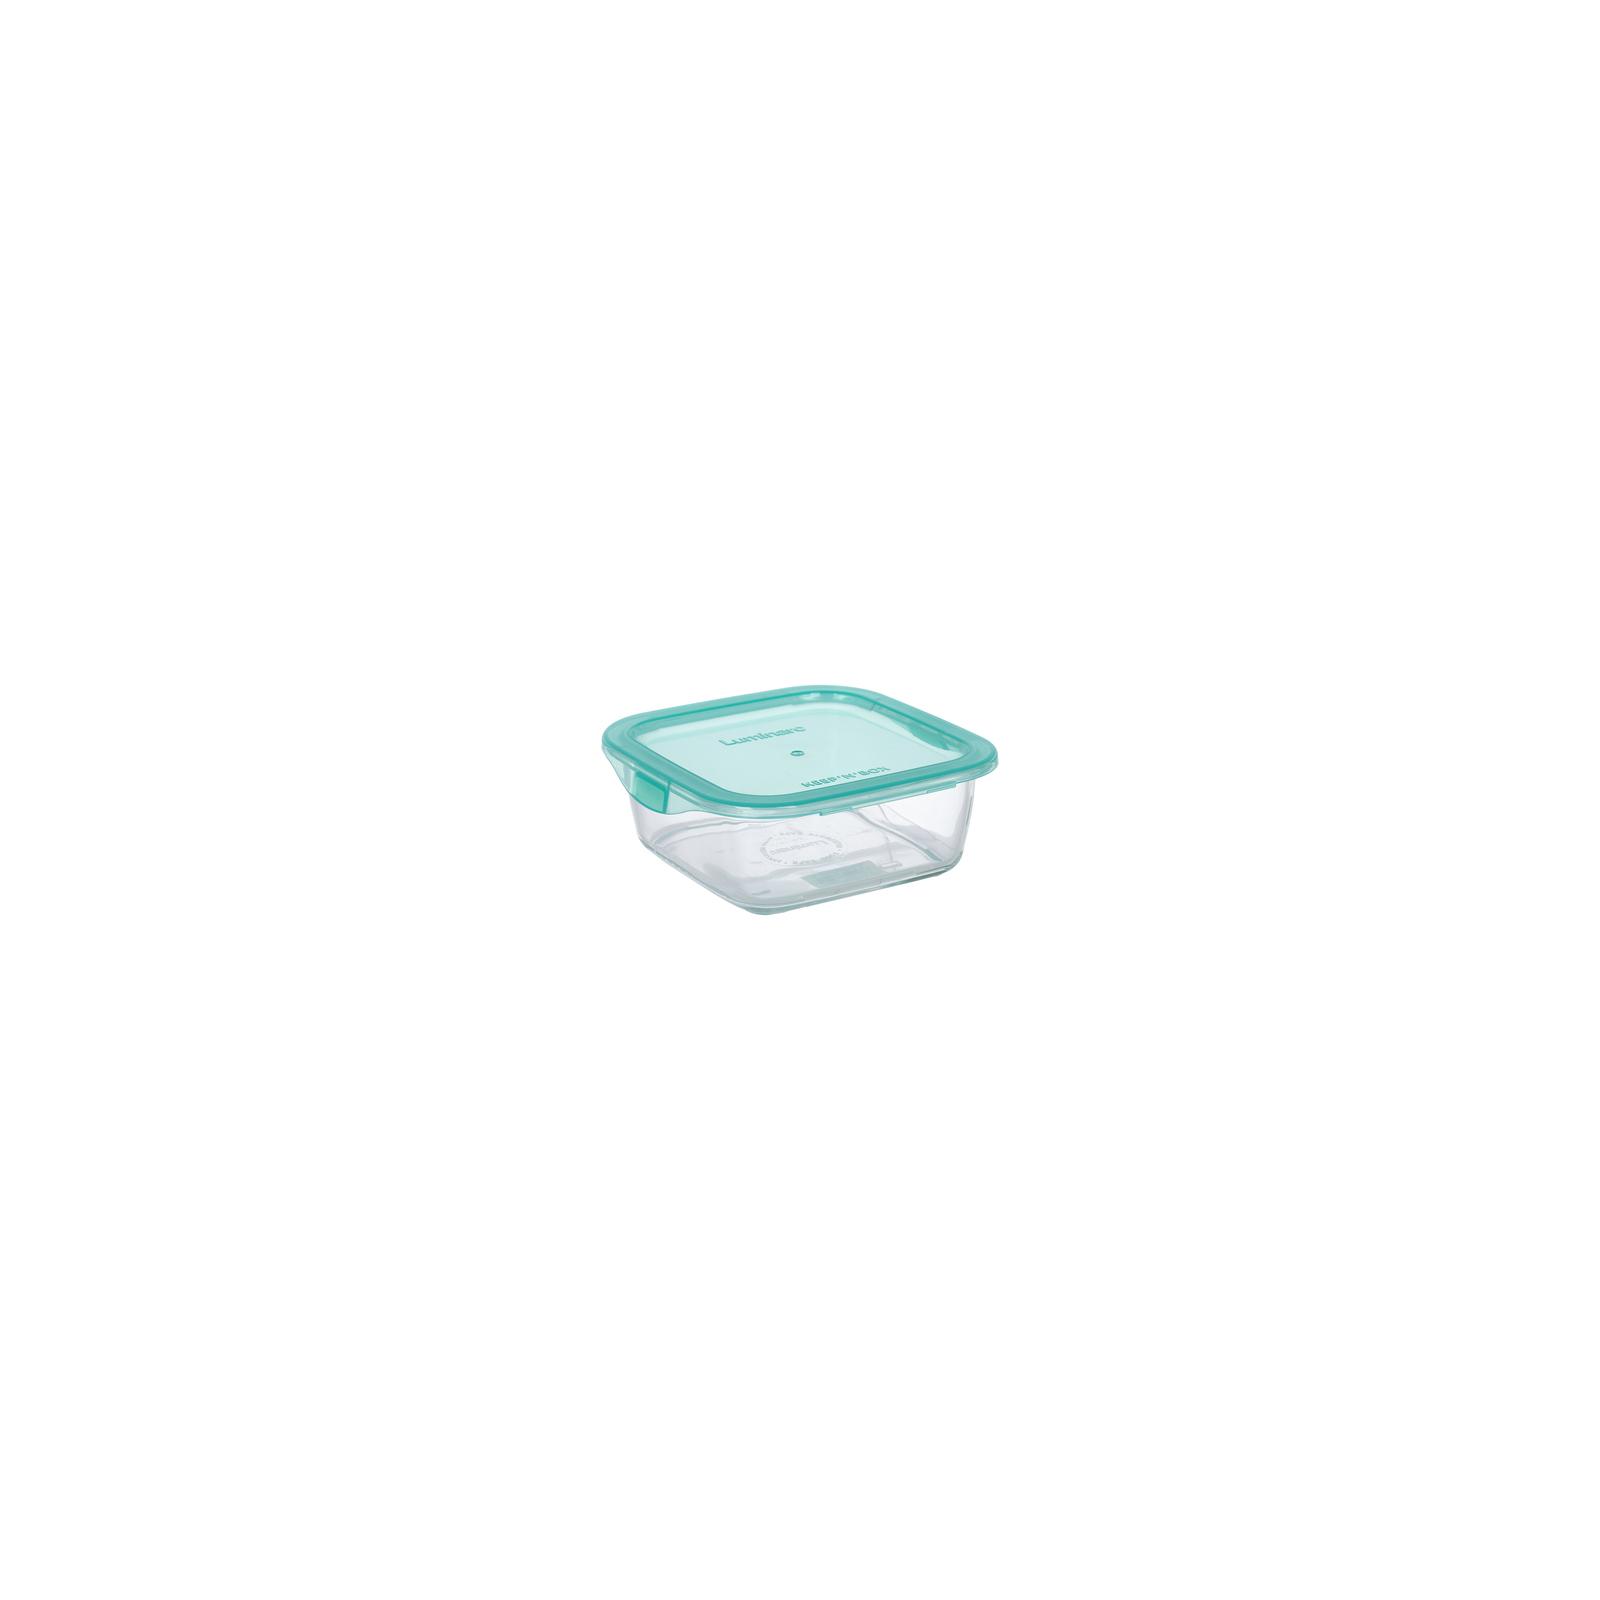 Пищевой контейнер Luminarc Keep'n Box Lagoon квадр. 760 мл (P5521)